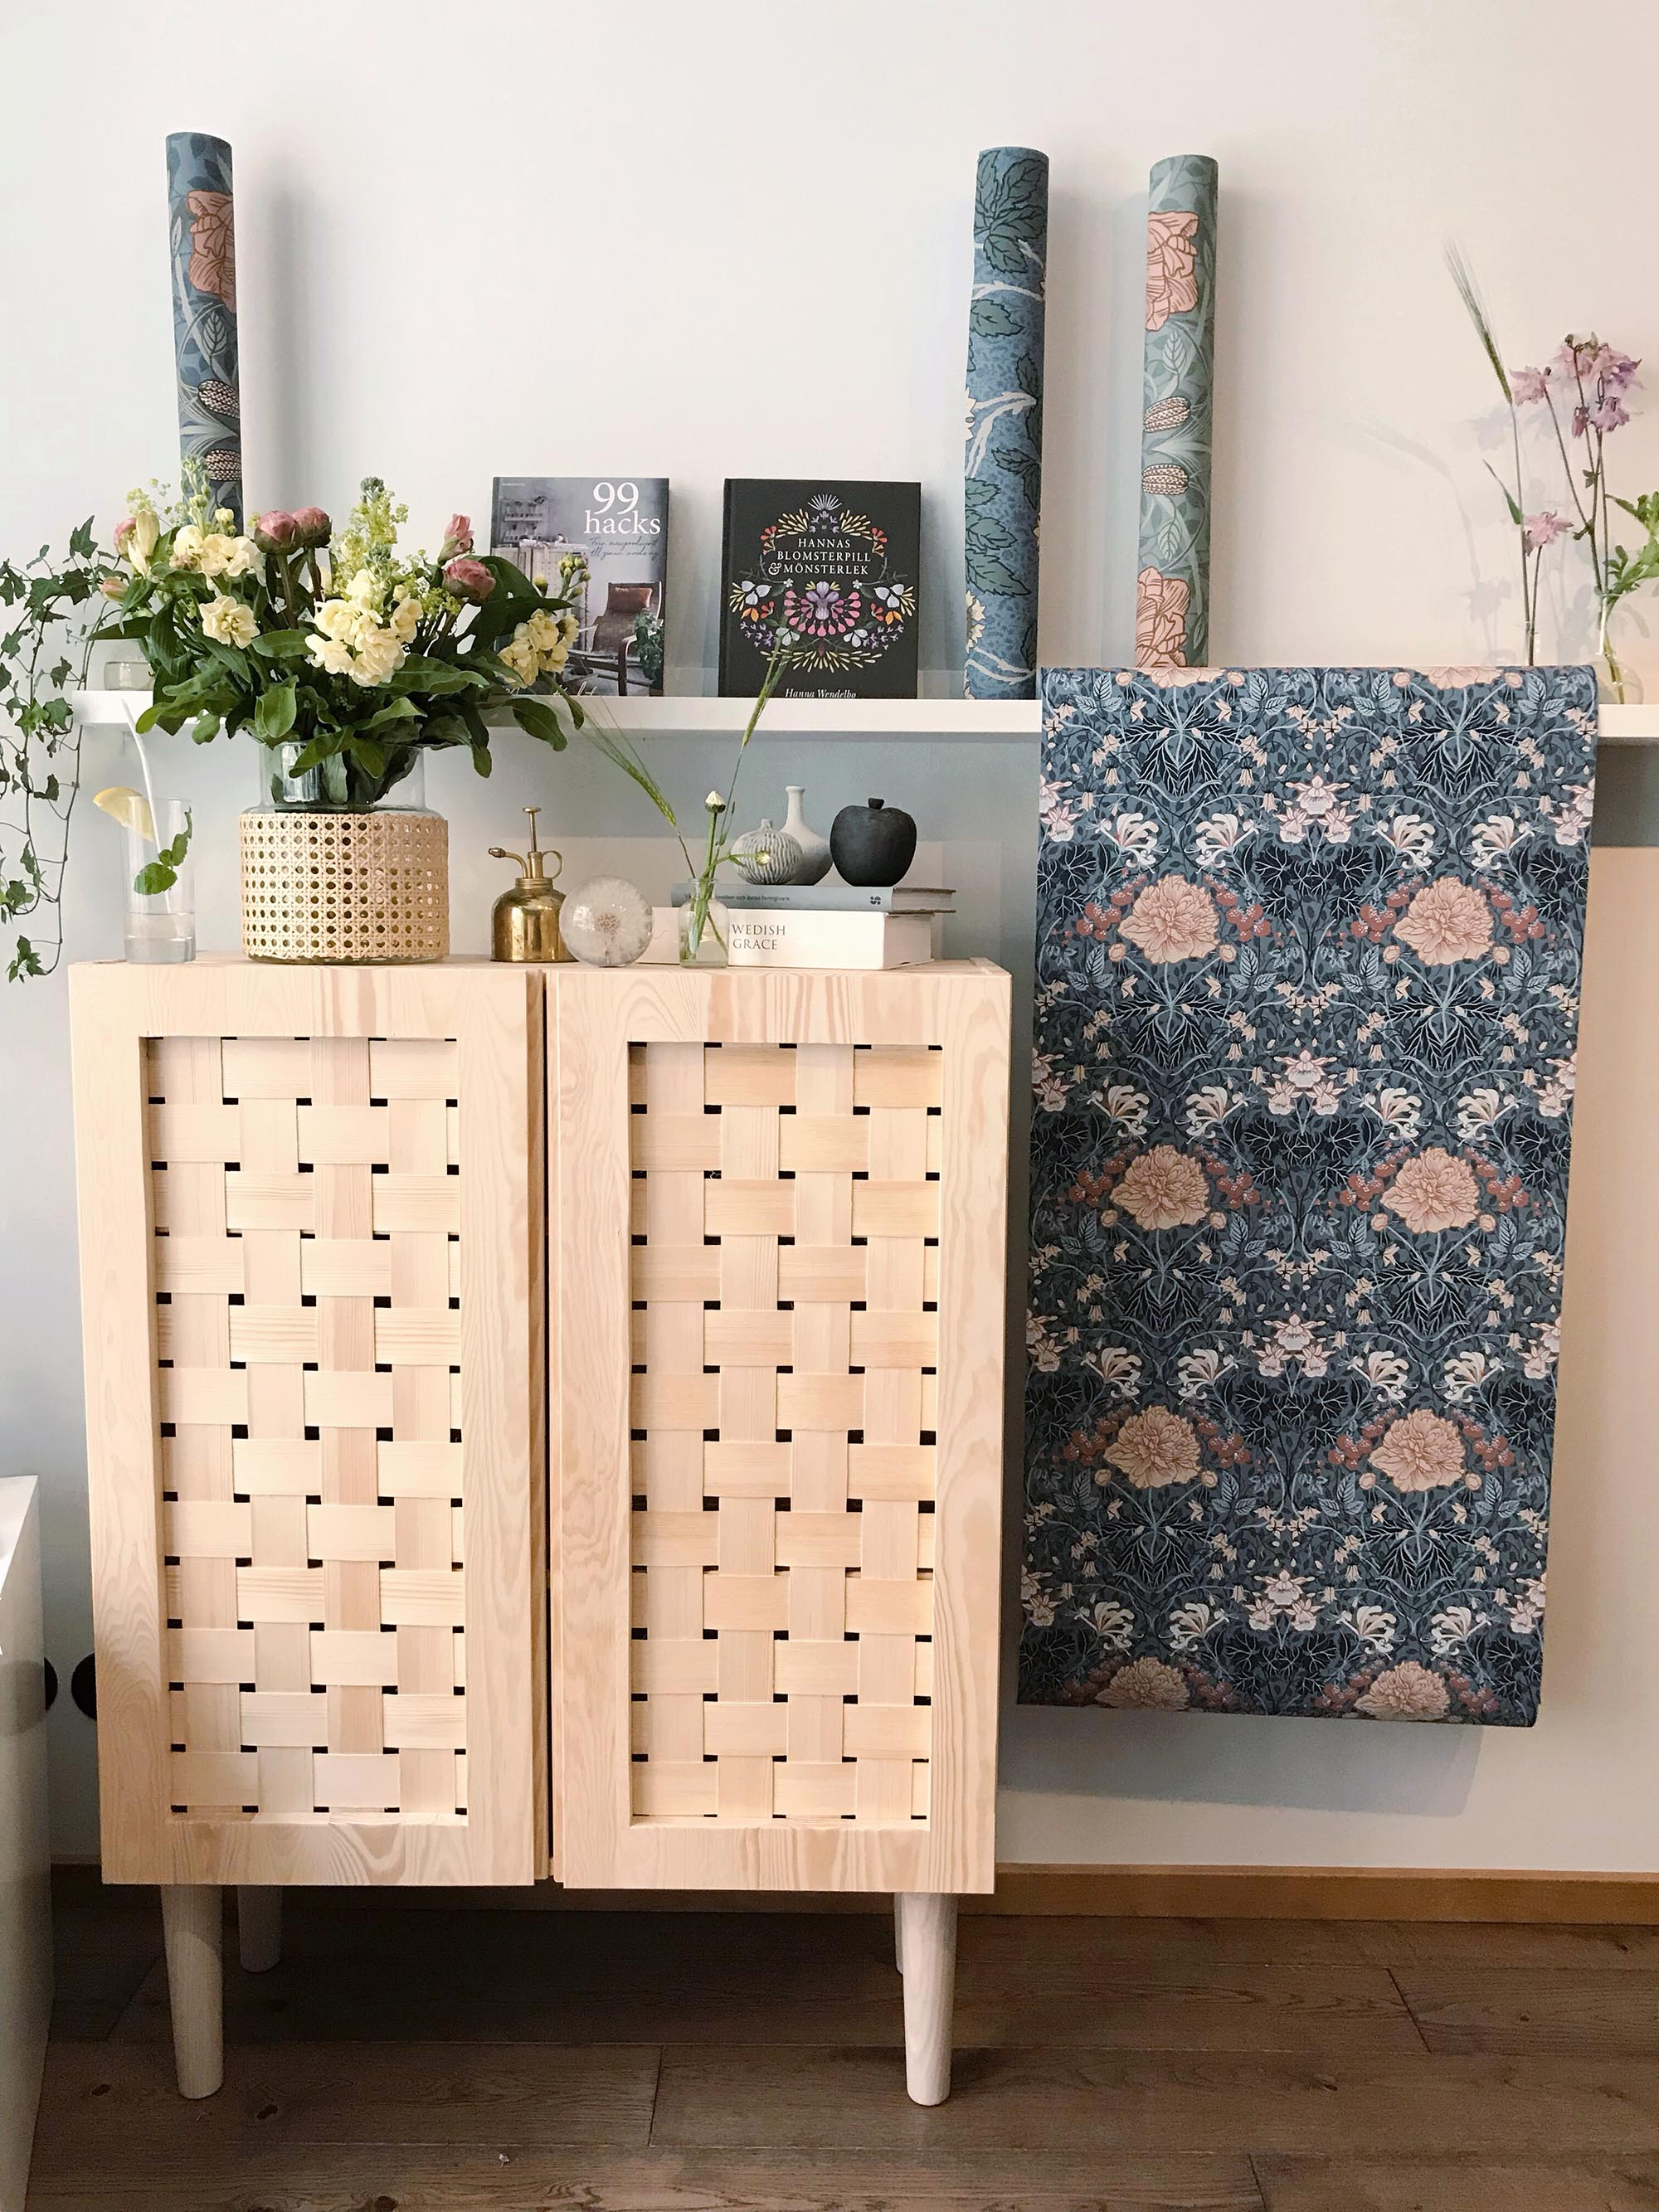 Bokrelease - 99 hacks + Hannas blomsterpill & mönsterlek